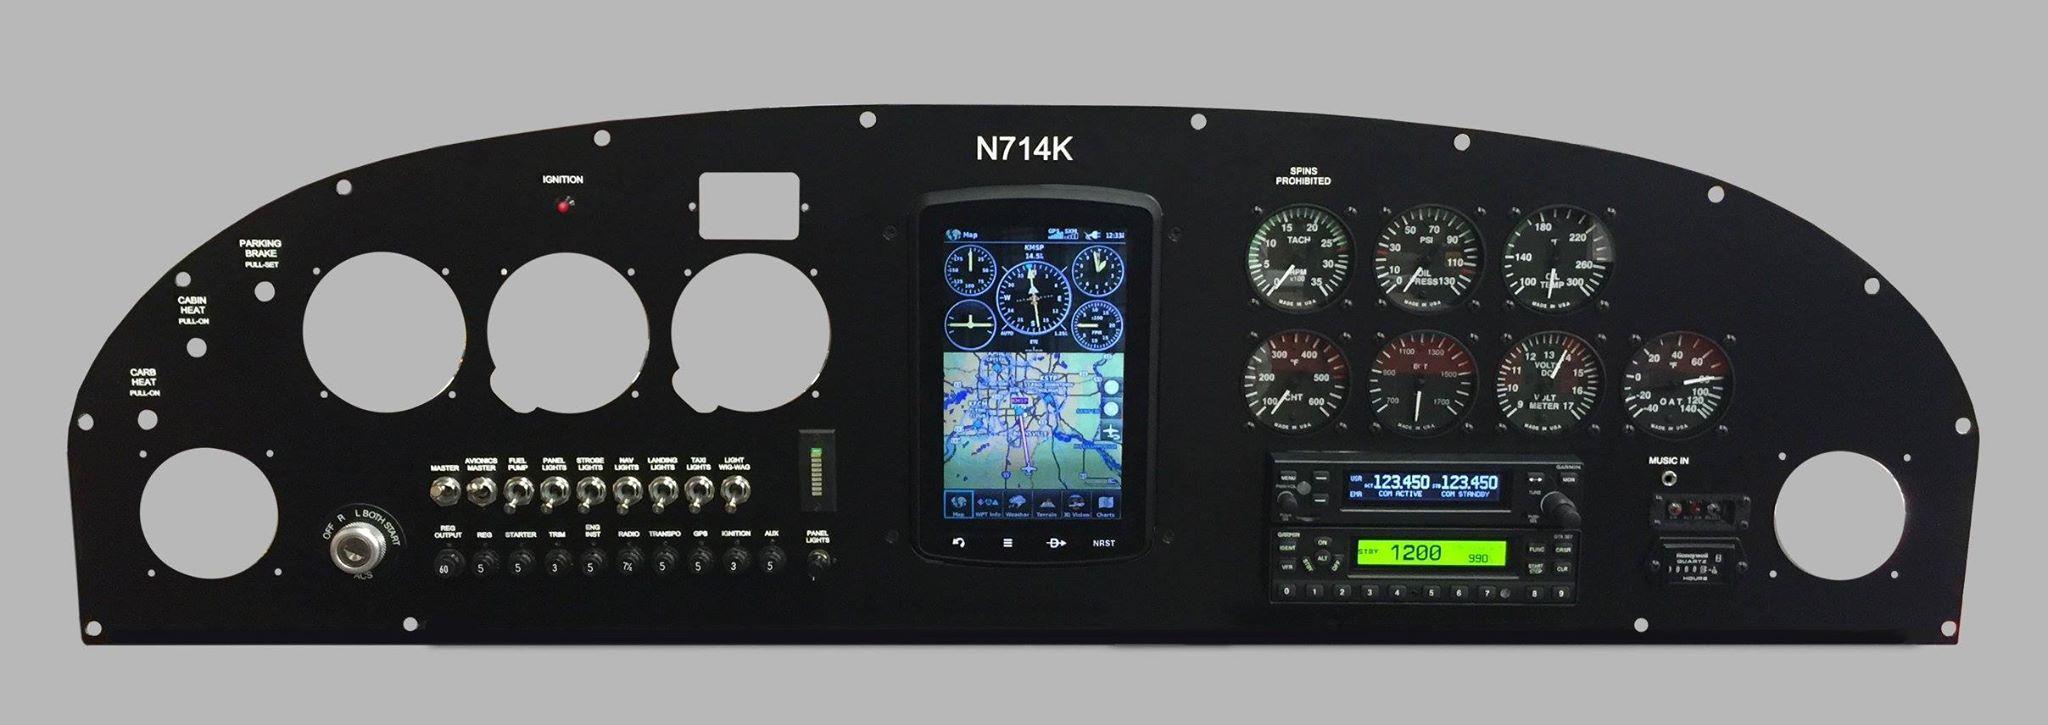 Great panel layout  | My Cessna 120/140/150 | Audio, Music